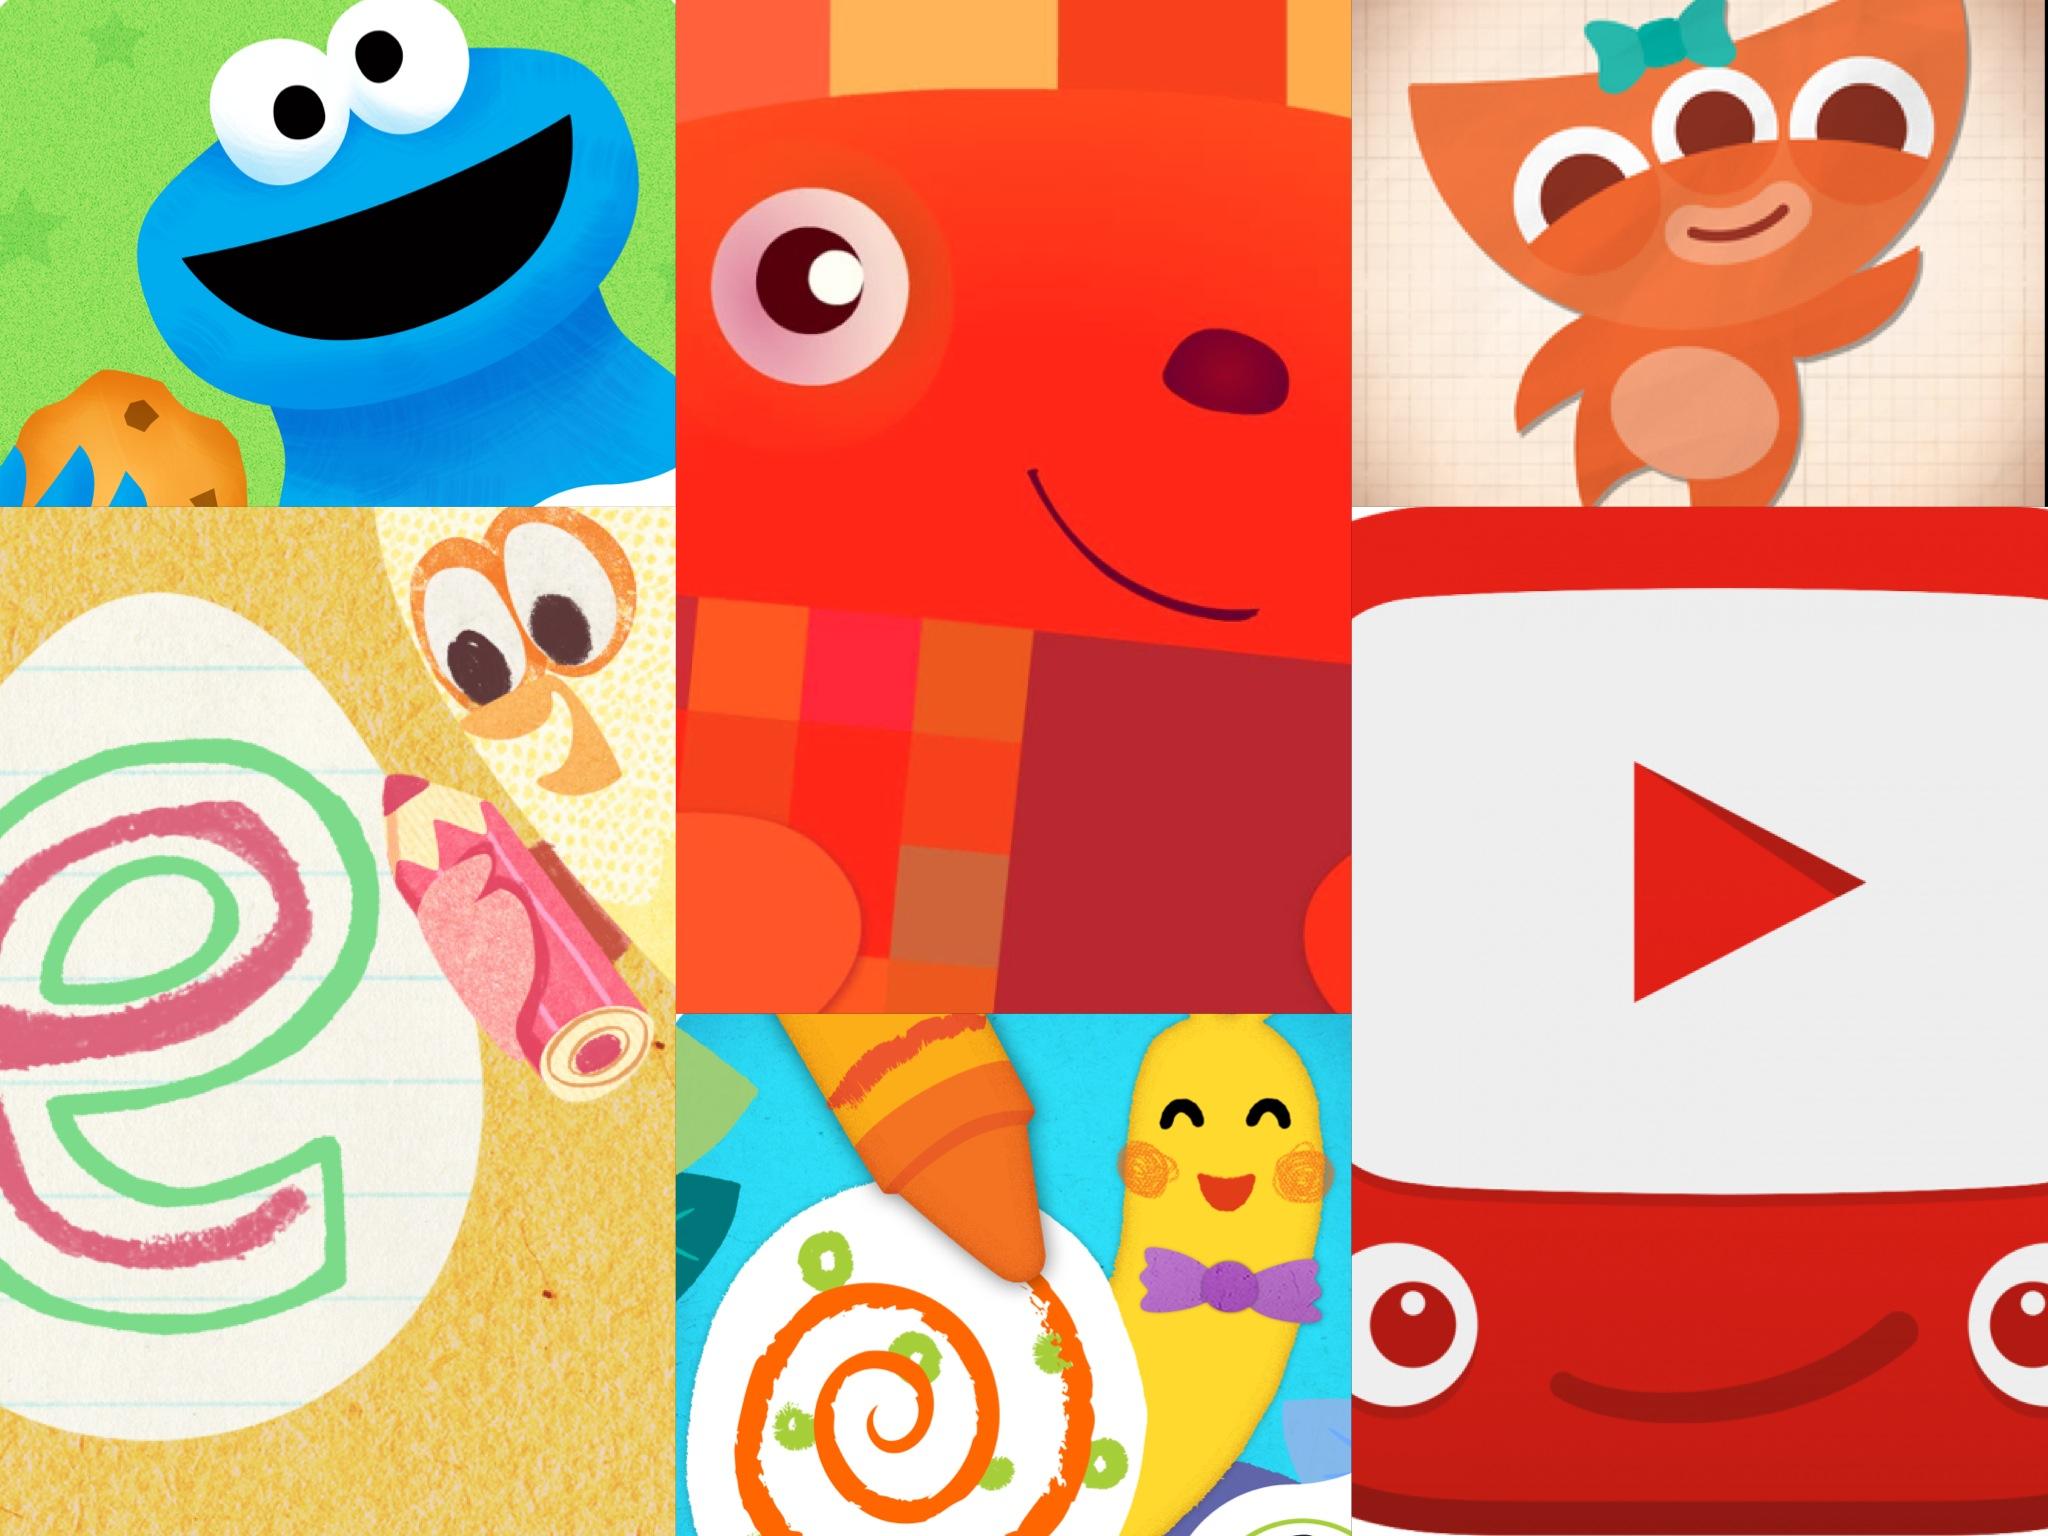 Worksheet Kindergarten Math Help worksheet kindergarten math help mikyu free 6 apps to get kids ready parentmap from basics